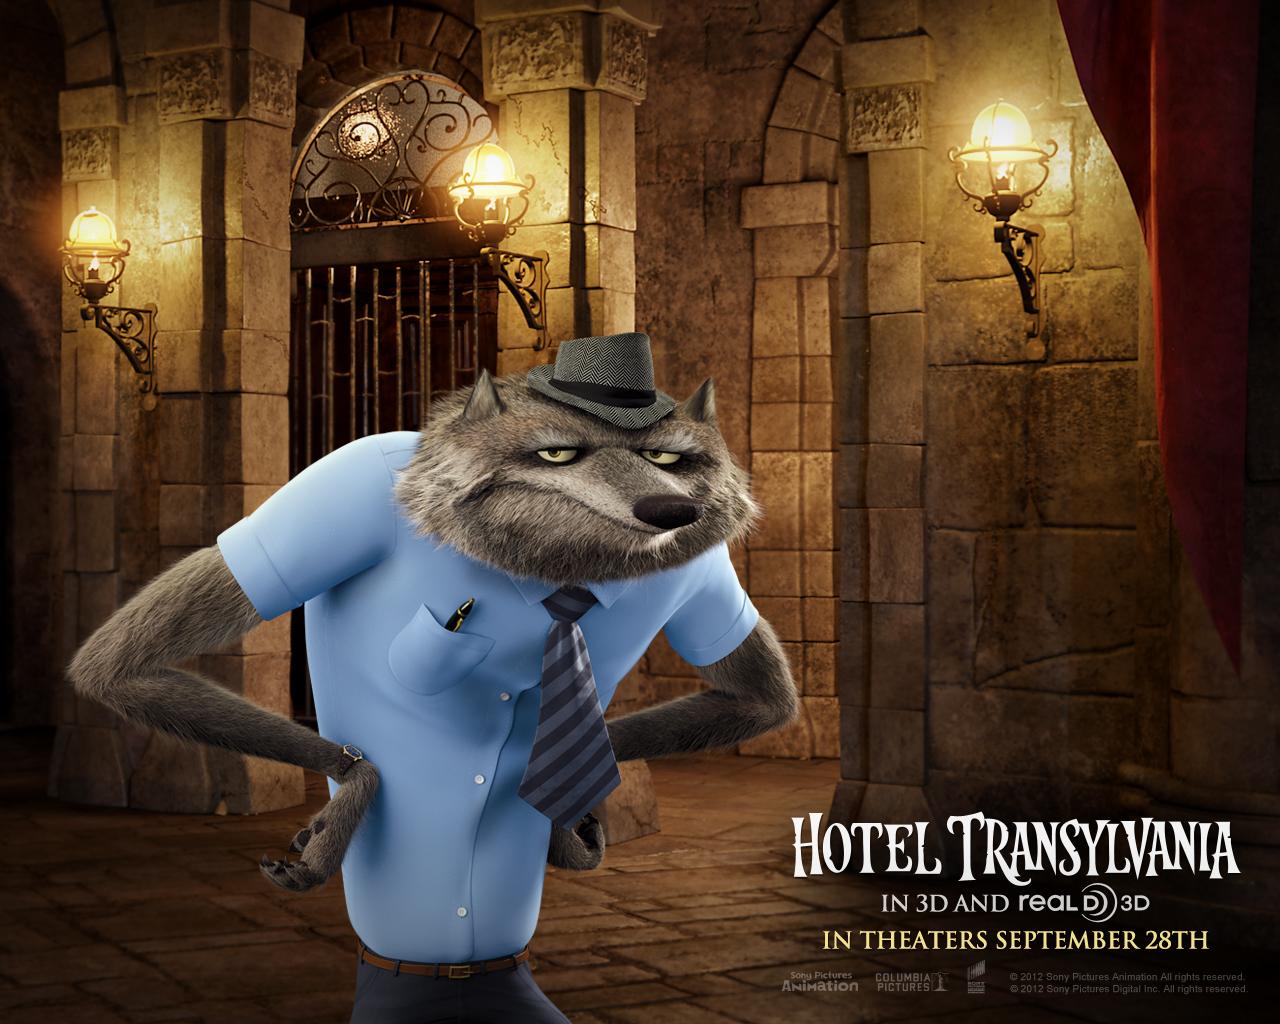 http://3.bp.blogspot.com/-cYVzx_hQg7I/ULWNF07fQlI/AAAAAAAANMw/KCYqGWADwEY/s1600/Hotel-Transylvania-Wallpaper-06.jpg